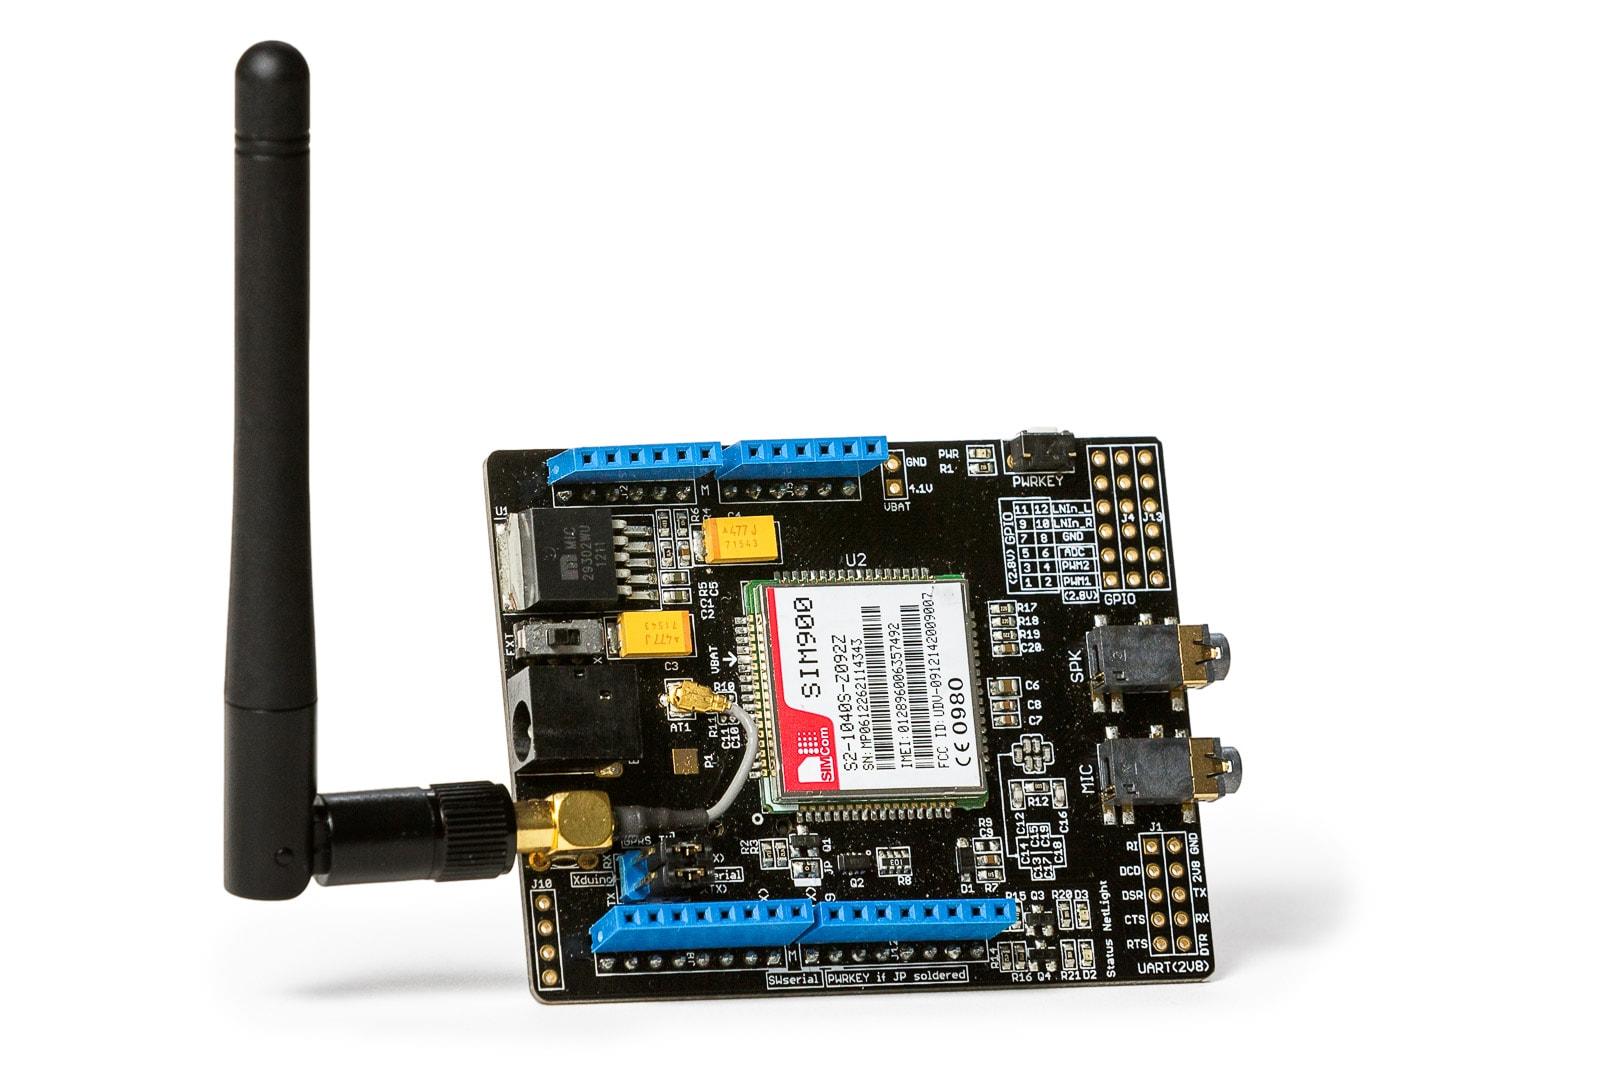 Wireless controller circuit board close-up